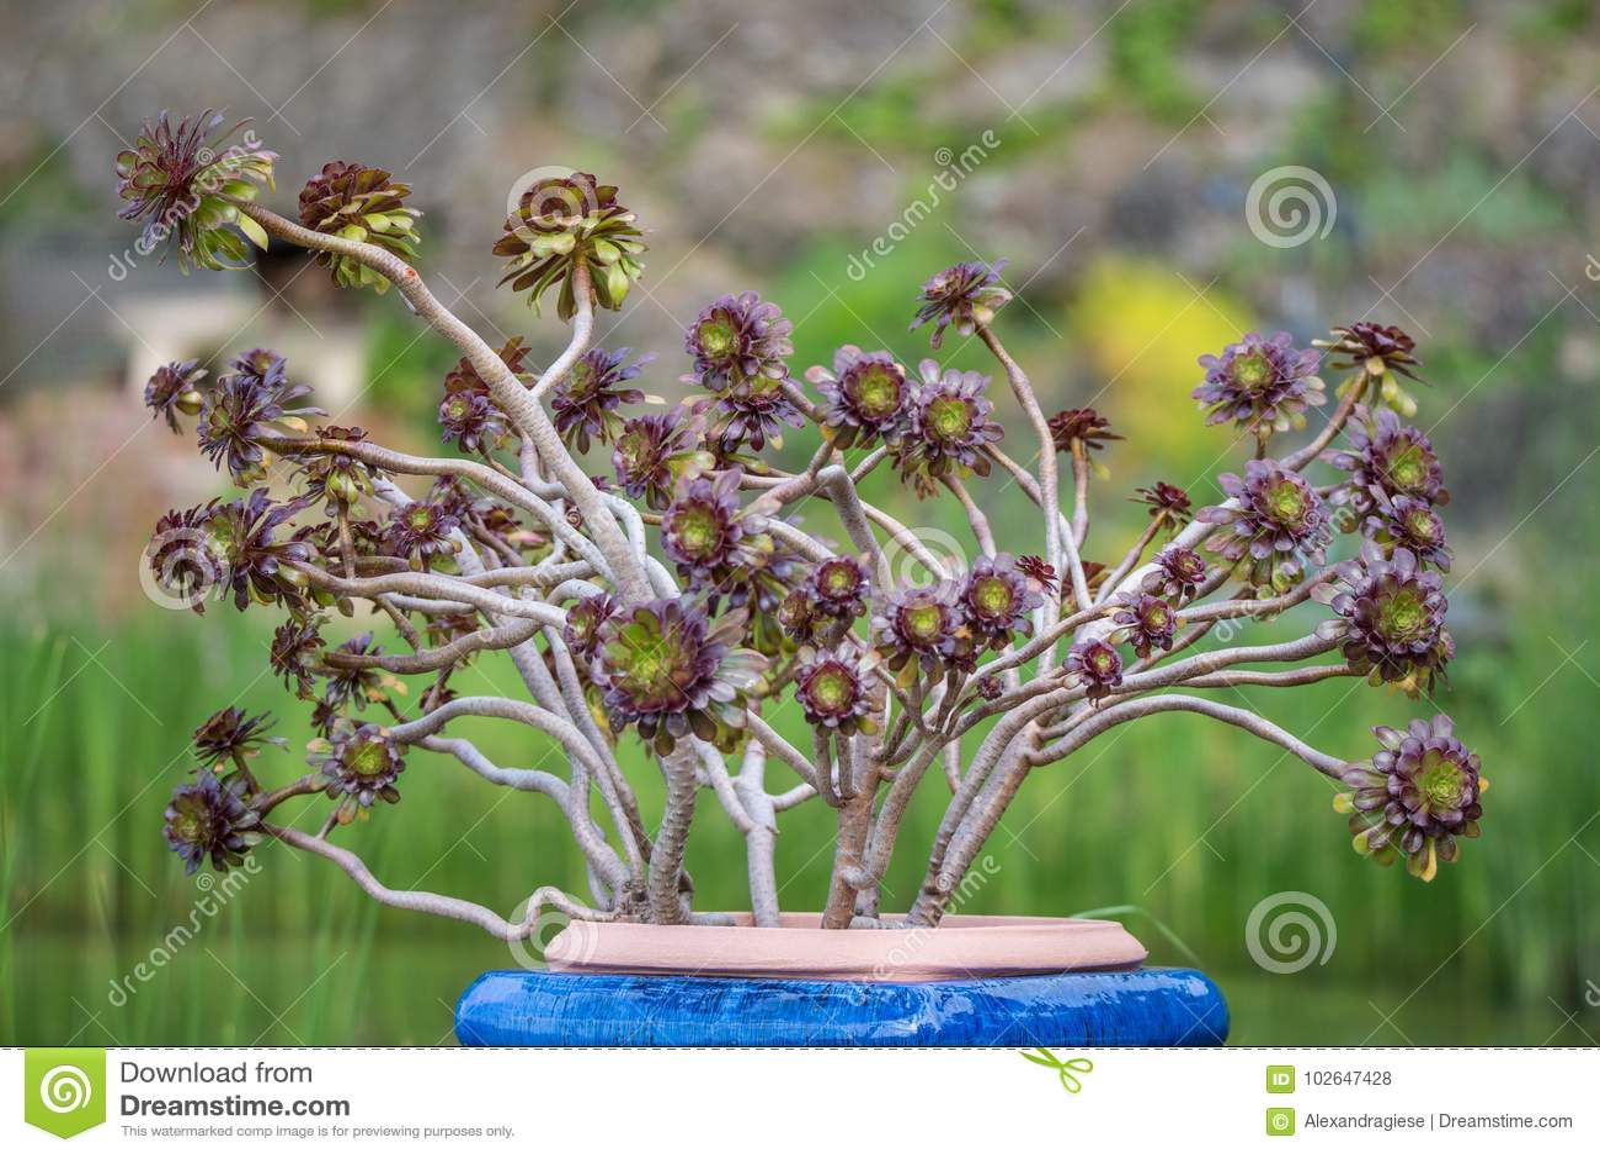 Aeonium δέντρων σε ένα μπλε δοχείο